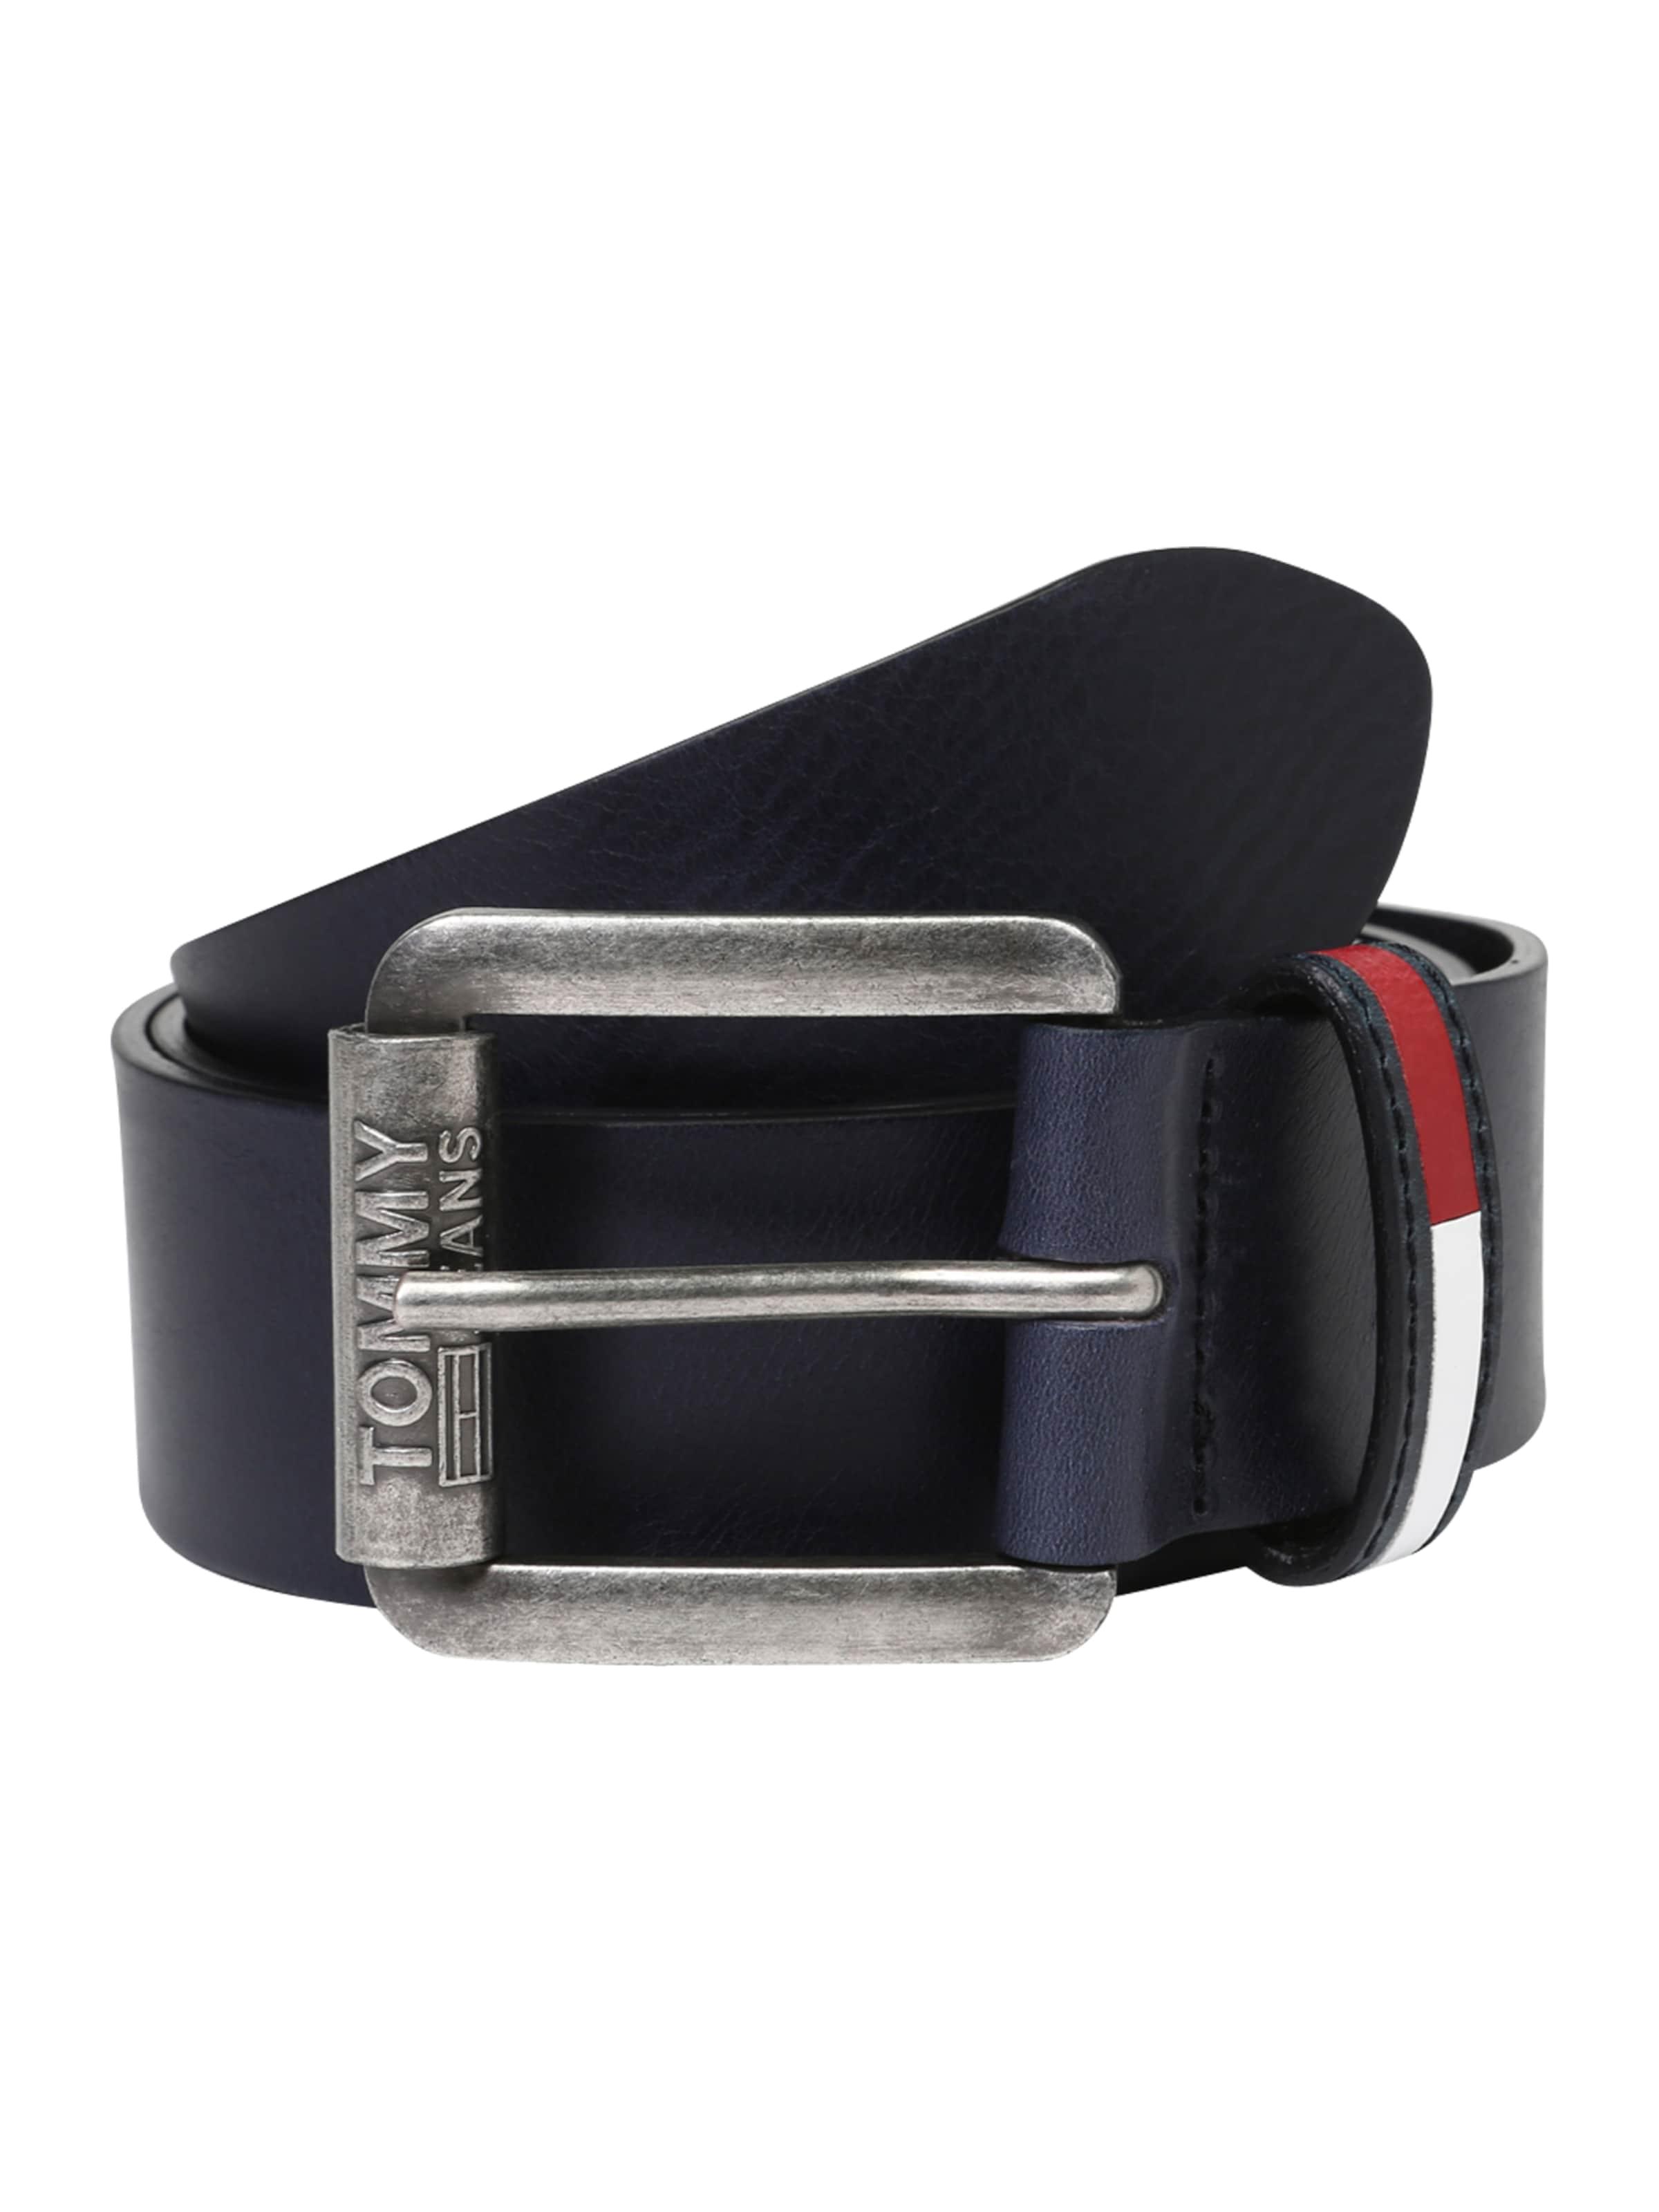 Jeans Riem 0' 4 'tjm Belt Zwart Logo In Roller Tommy shxBtQCrd